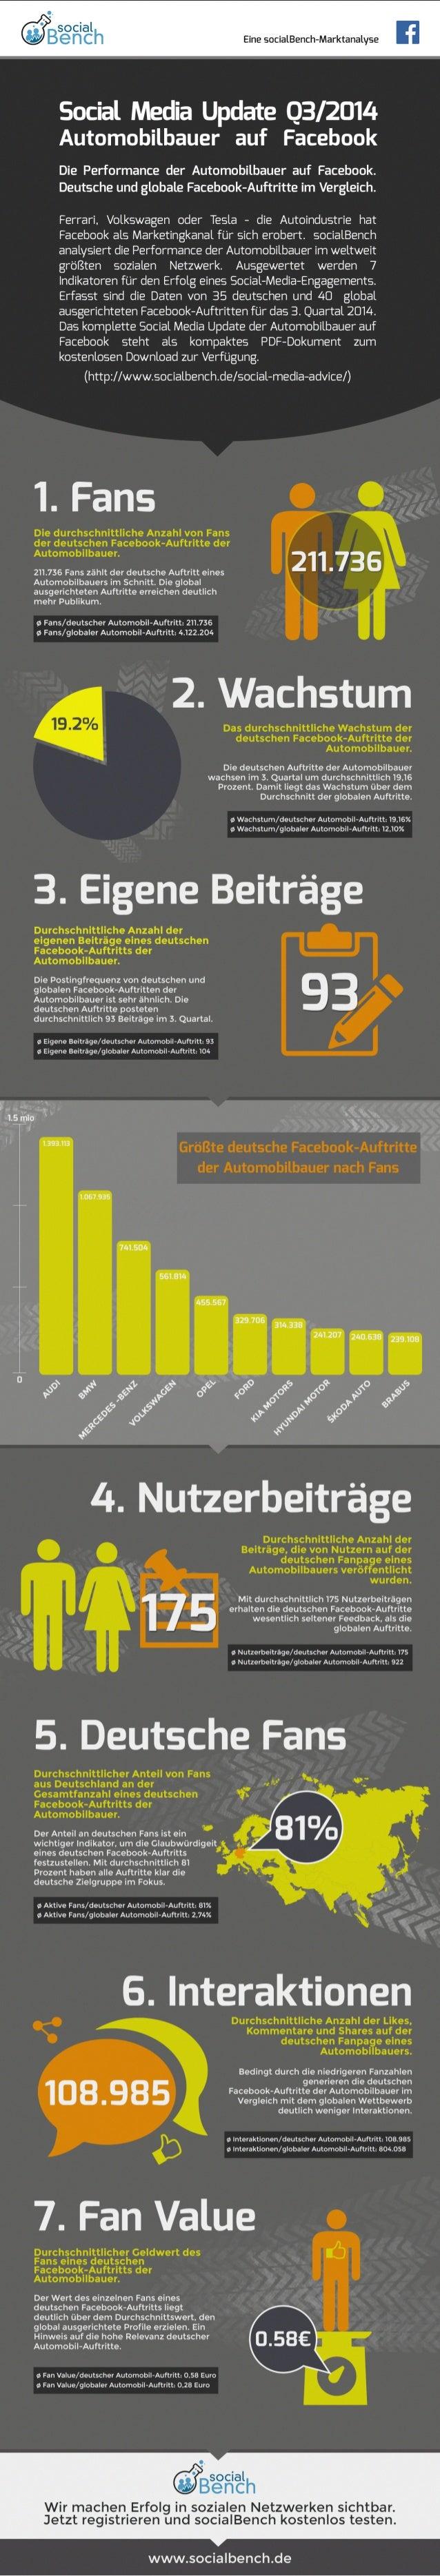 Infografik: Social Media Update Q3/2014 - Automobilbauer auf Facebook